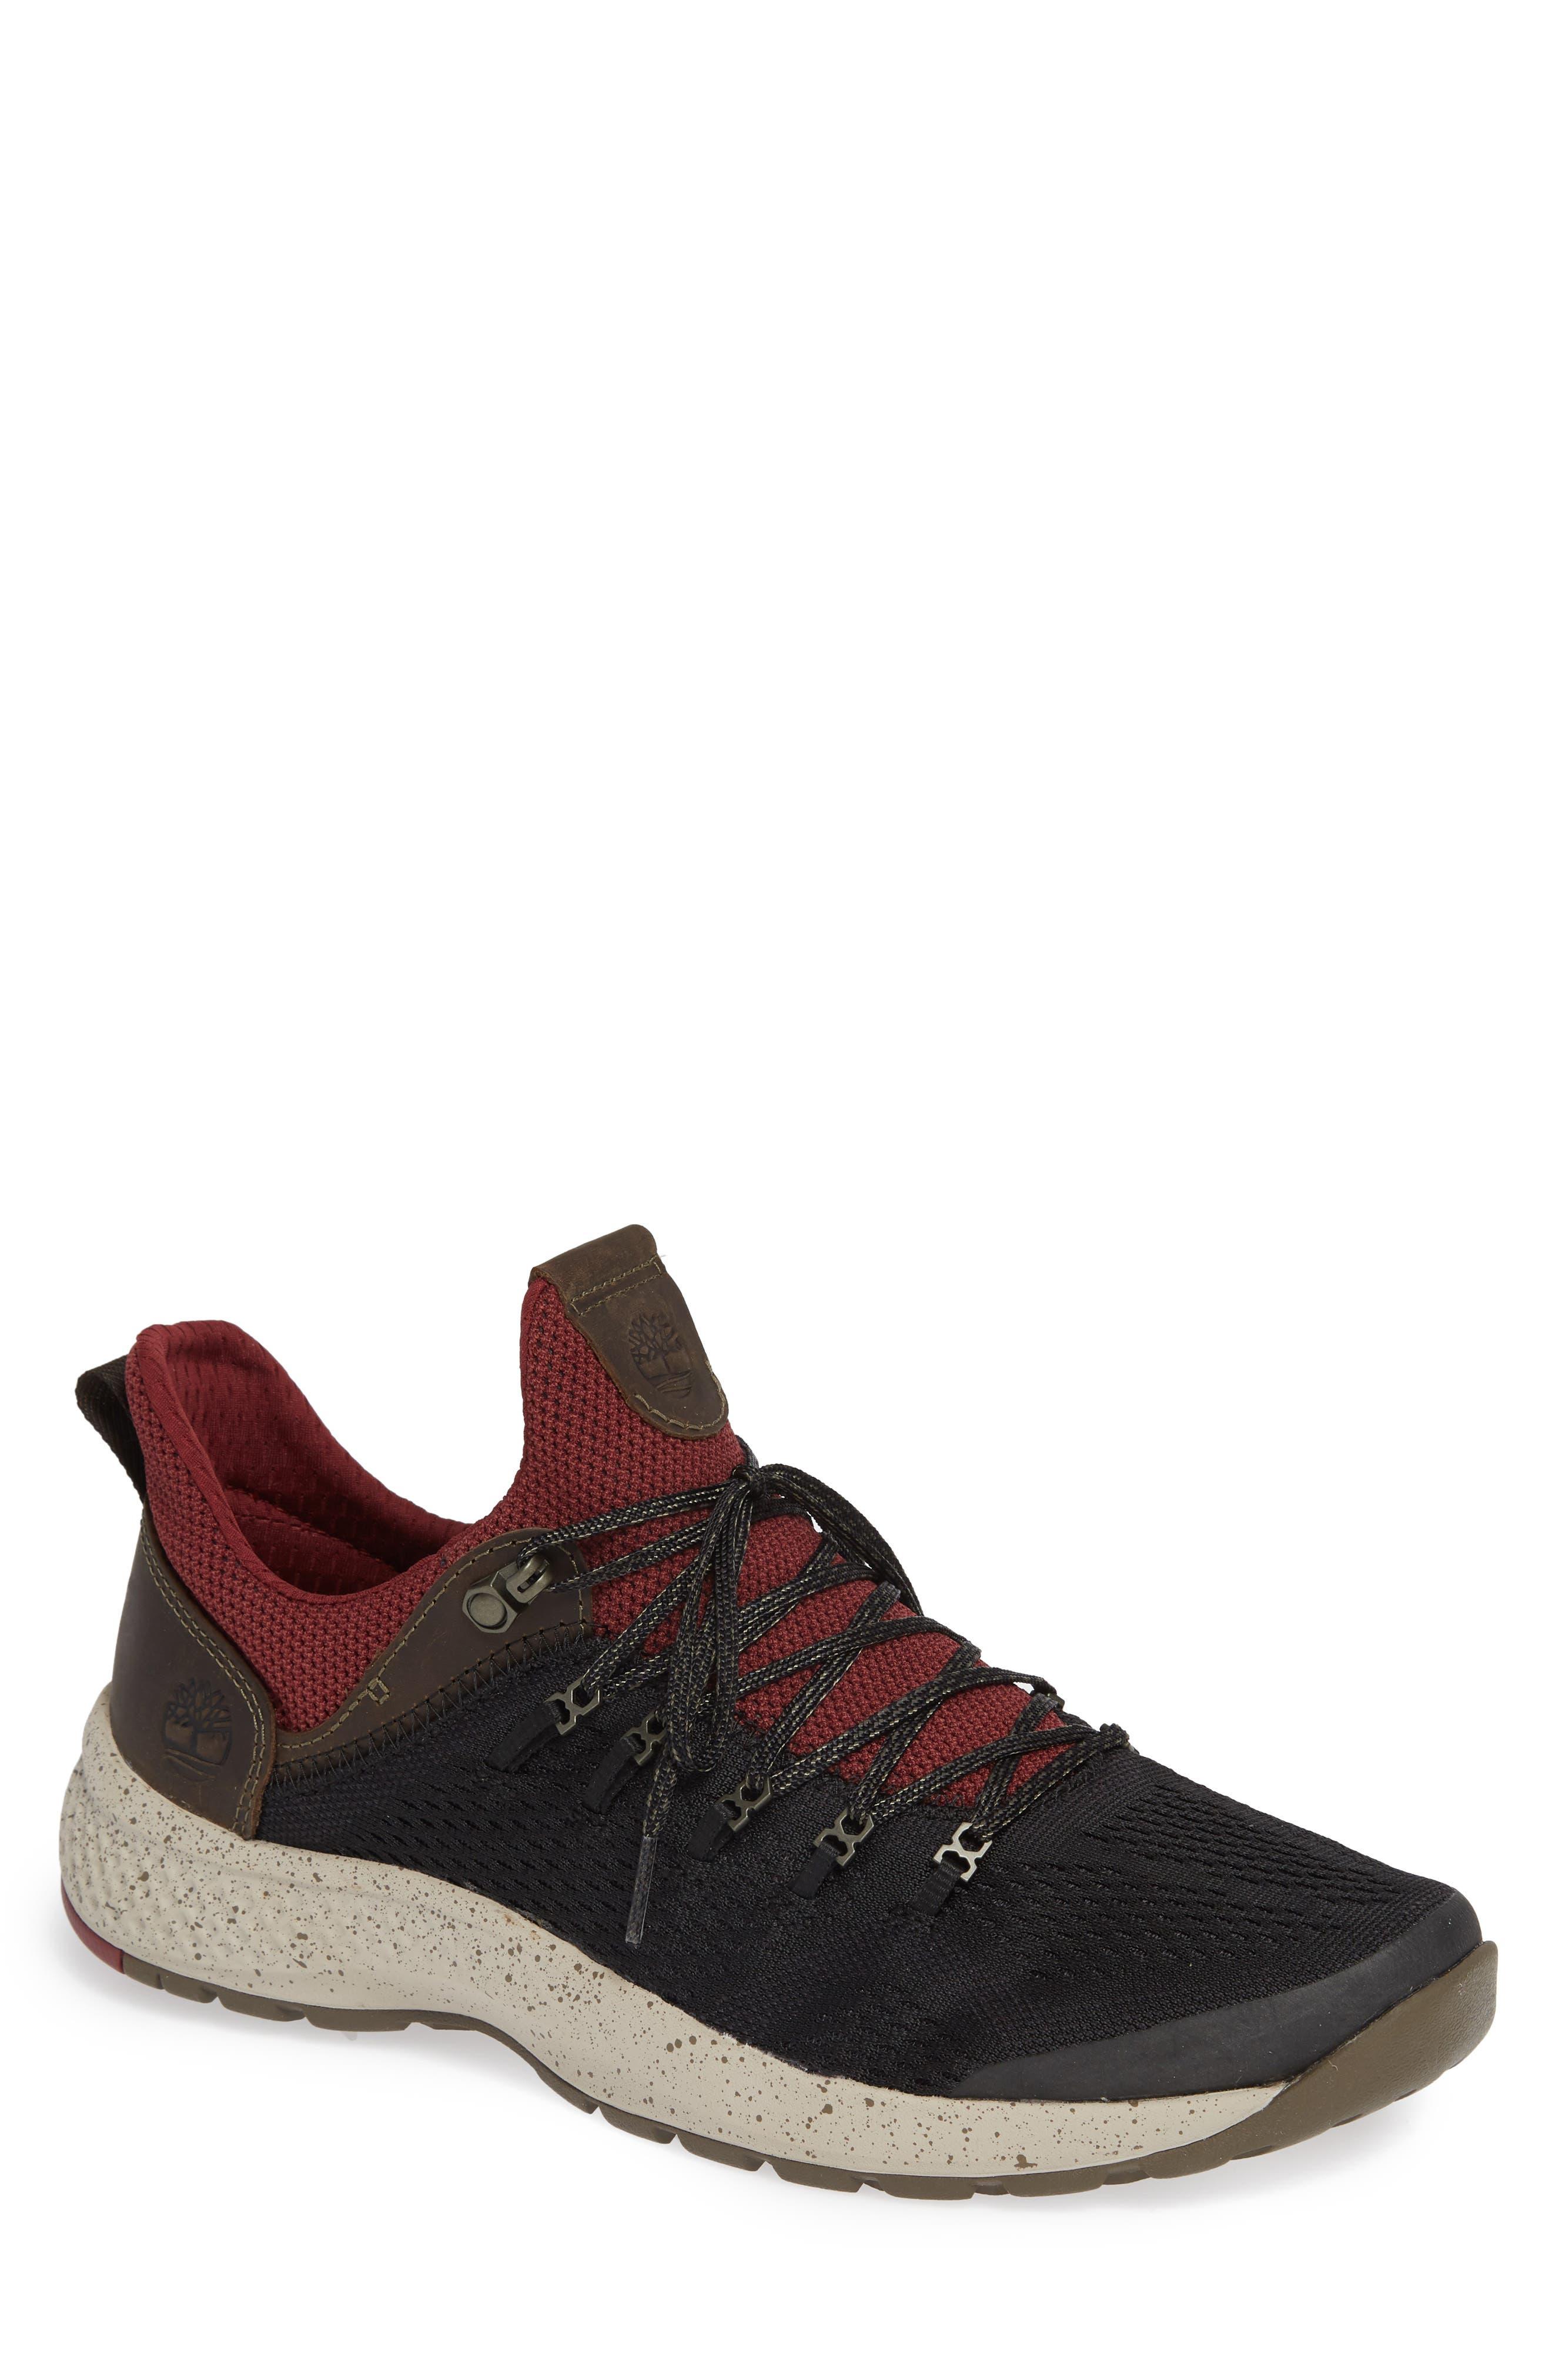 FlyRoam Trail Sneaker, Main, color, BLACK/ BURGUNDY